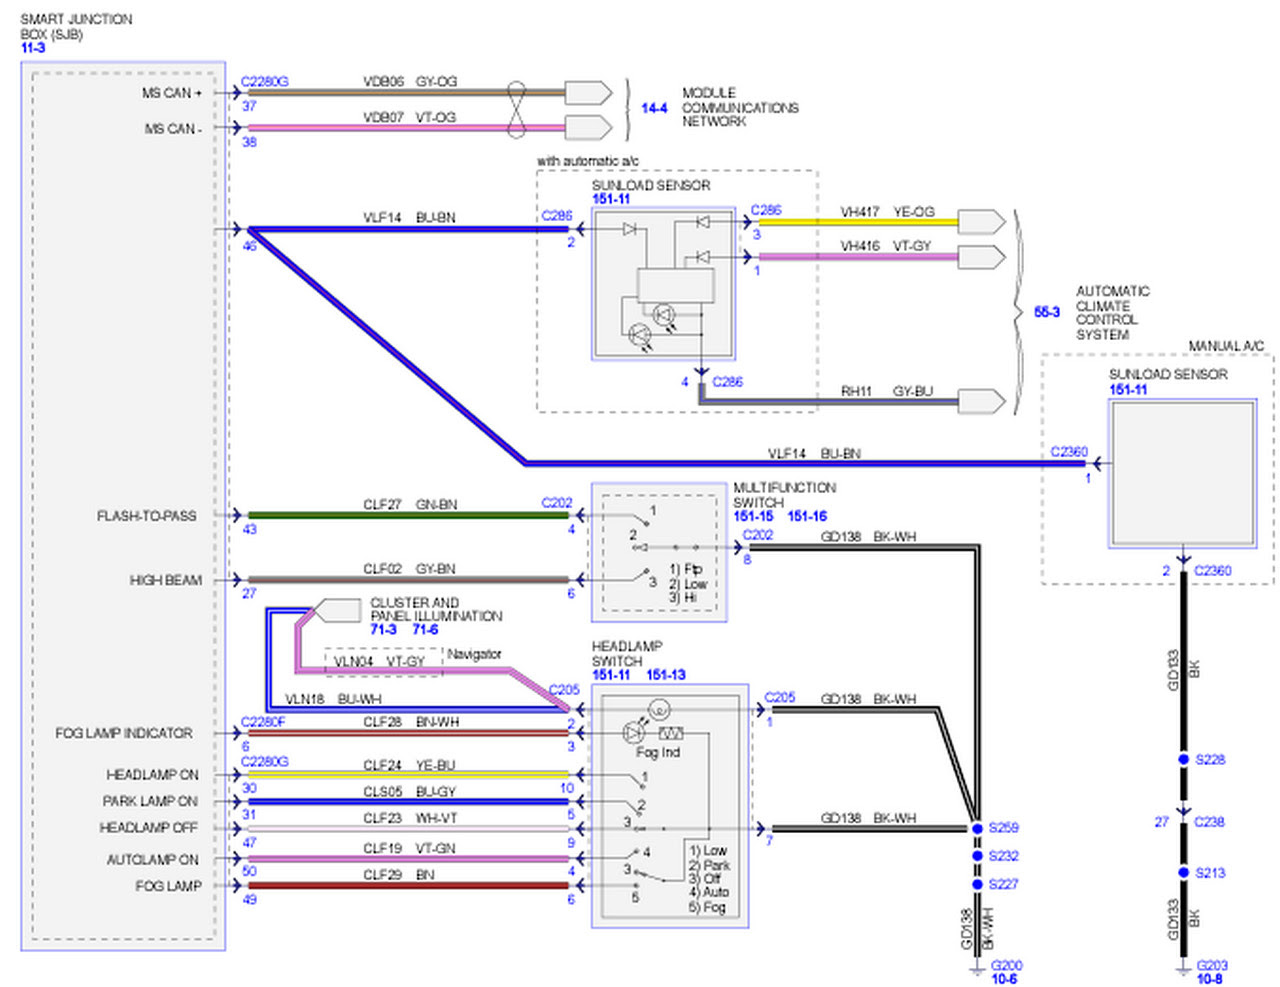 Diagram 2003 Ford Expedition Wiring Diagram Full Version Hd Quality Wiring Diagram M3e9ltrskematiki374 Fanfaradilegnano It